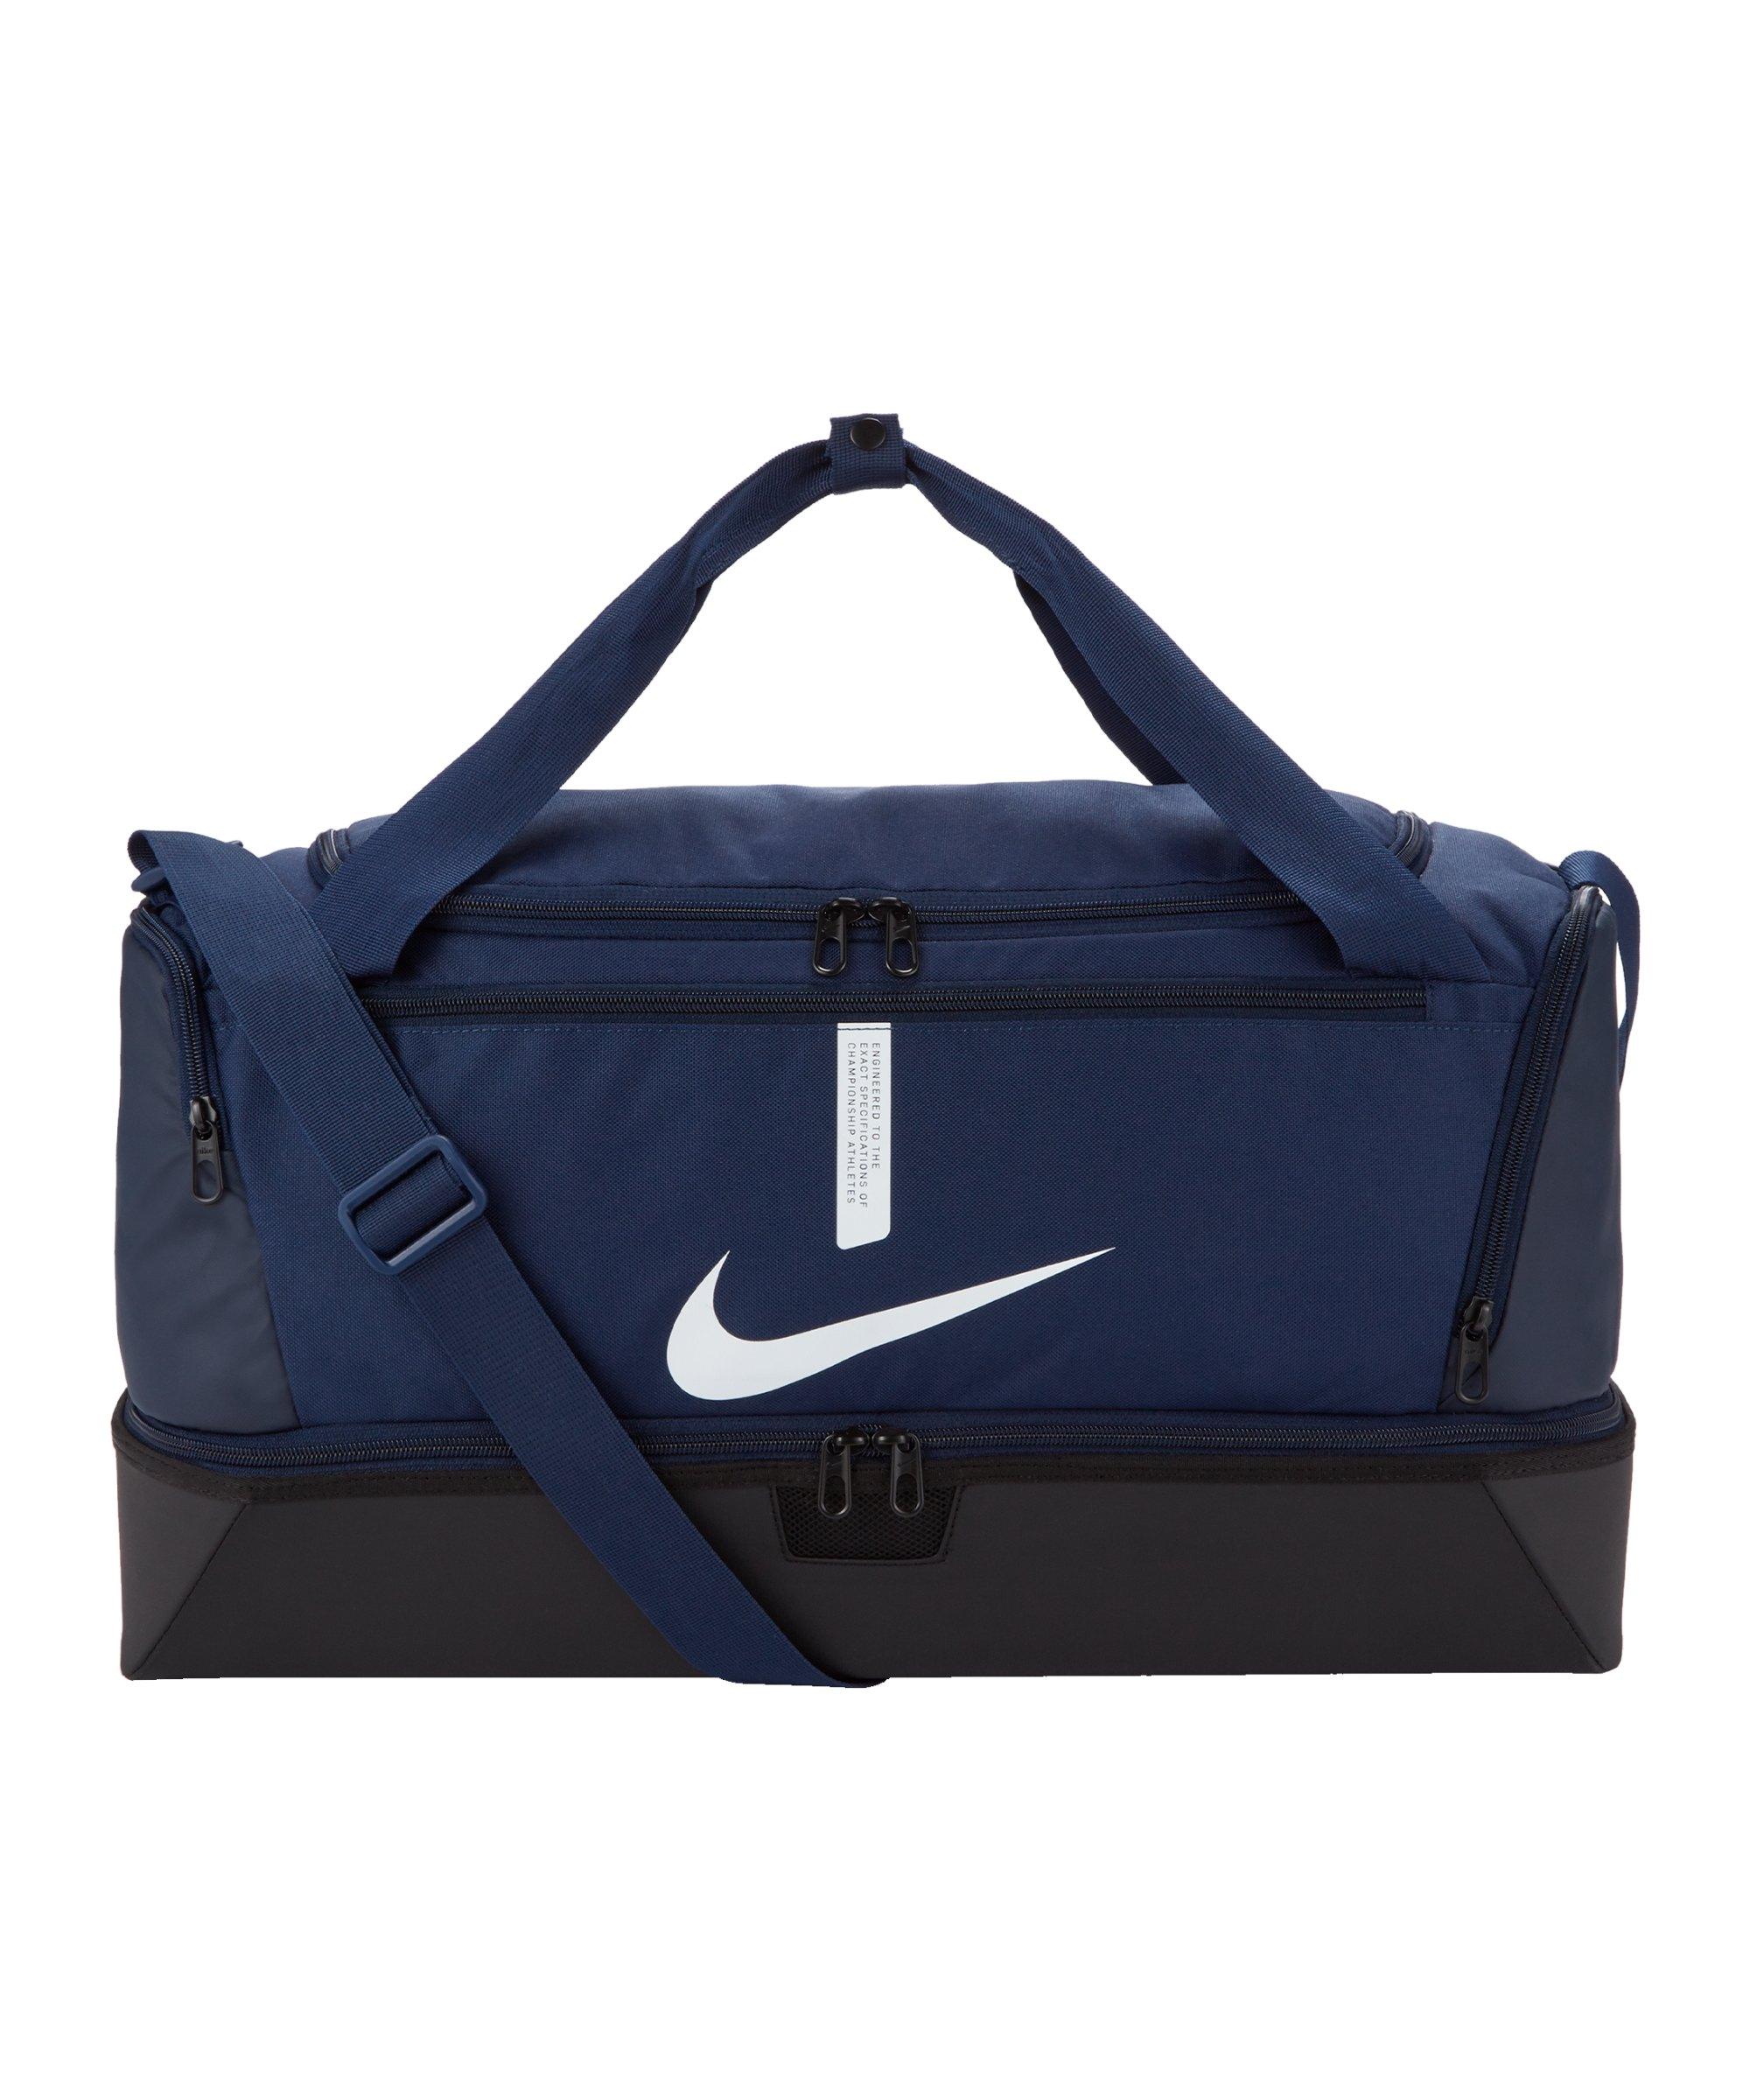 Nike Academy Team Hardcase Tasche Medium Blau F410 - blau